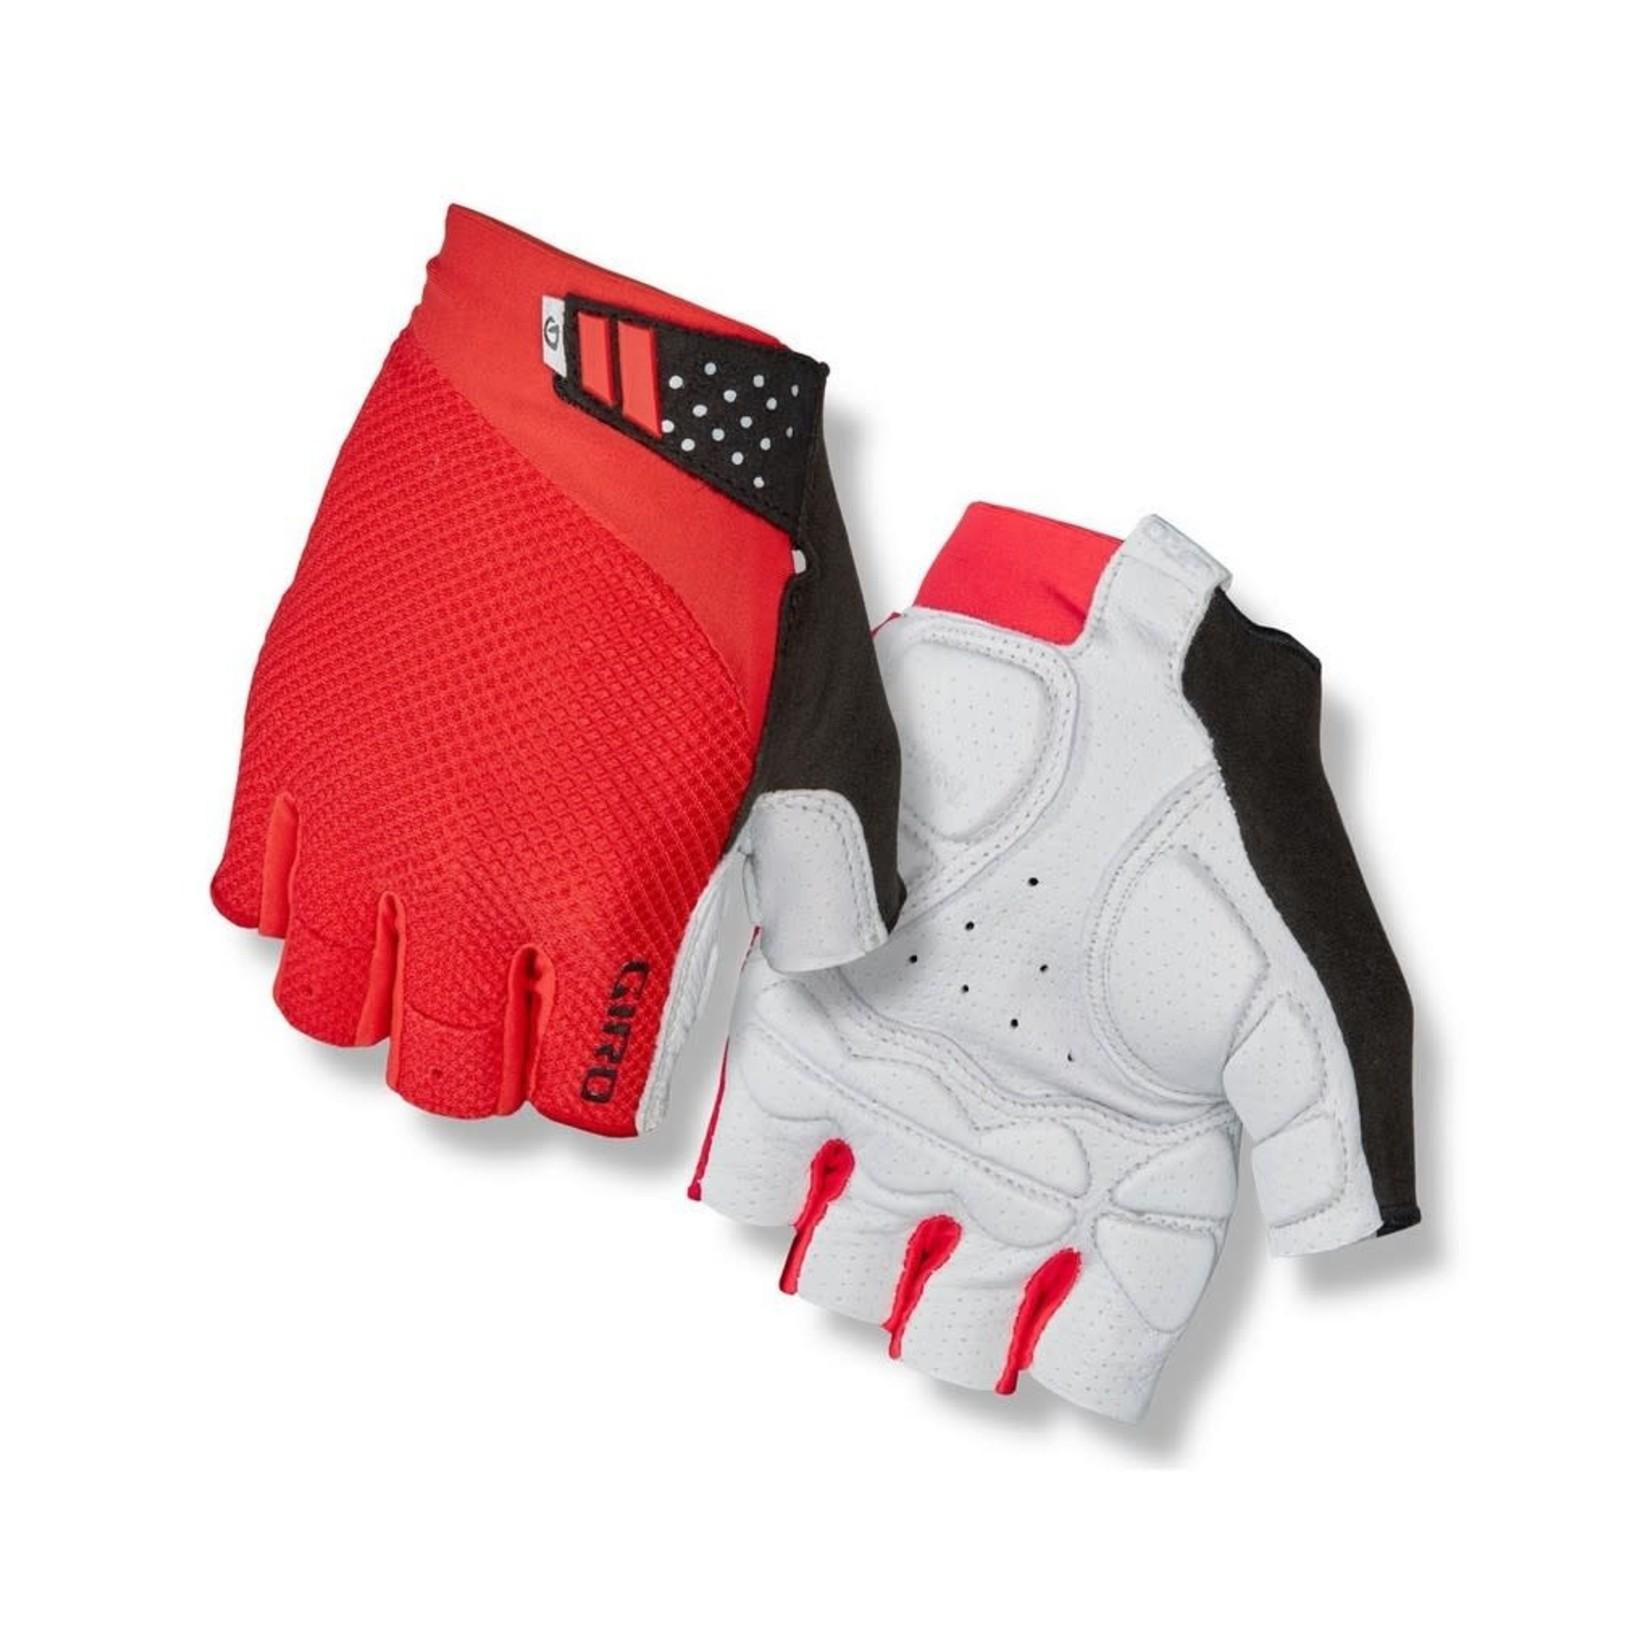 GIRO Gloves Giro Monaco II Gel Right Red